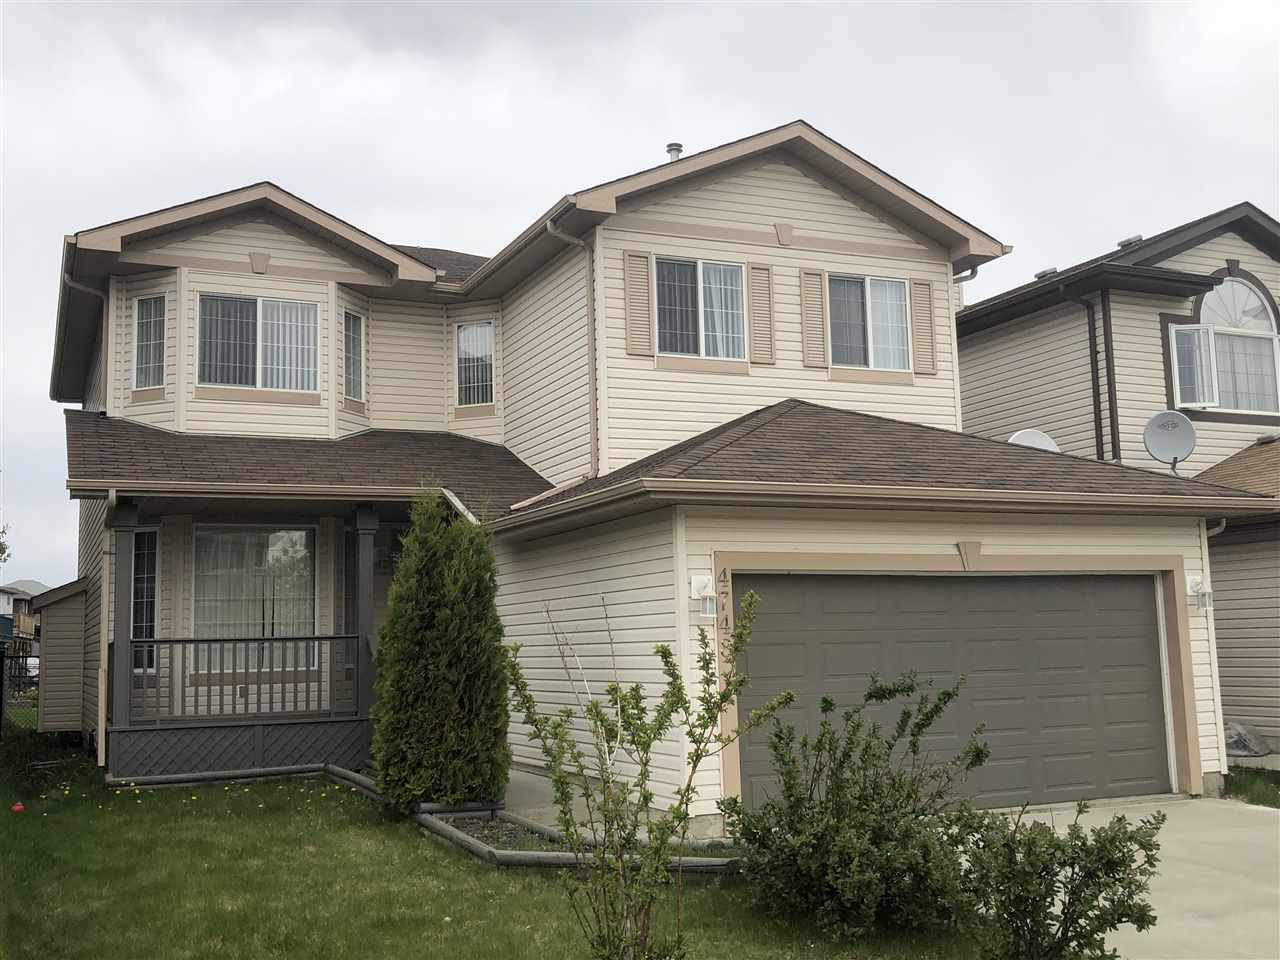 Main Photo: 4748 154 Avenue in Edmonton: Zone 03 House for sale : MLS®# E4182023